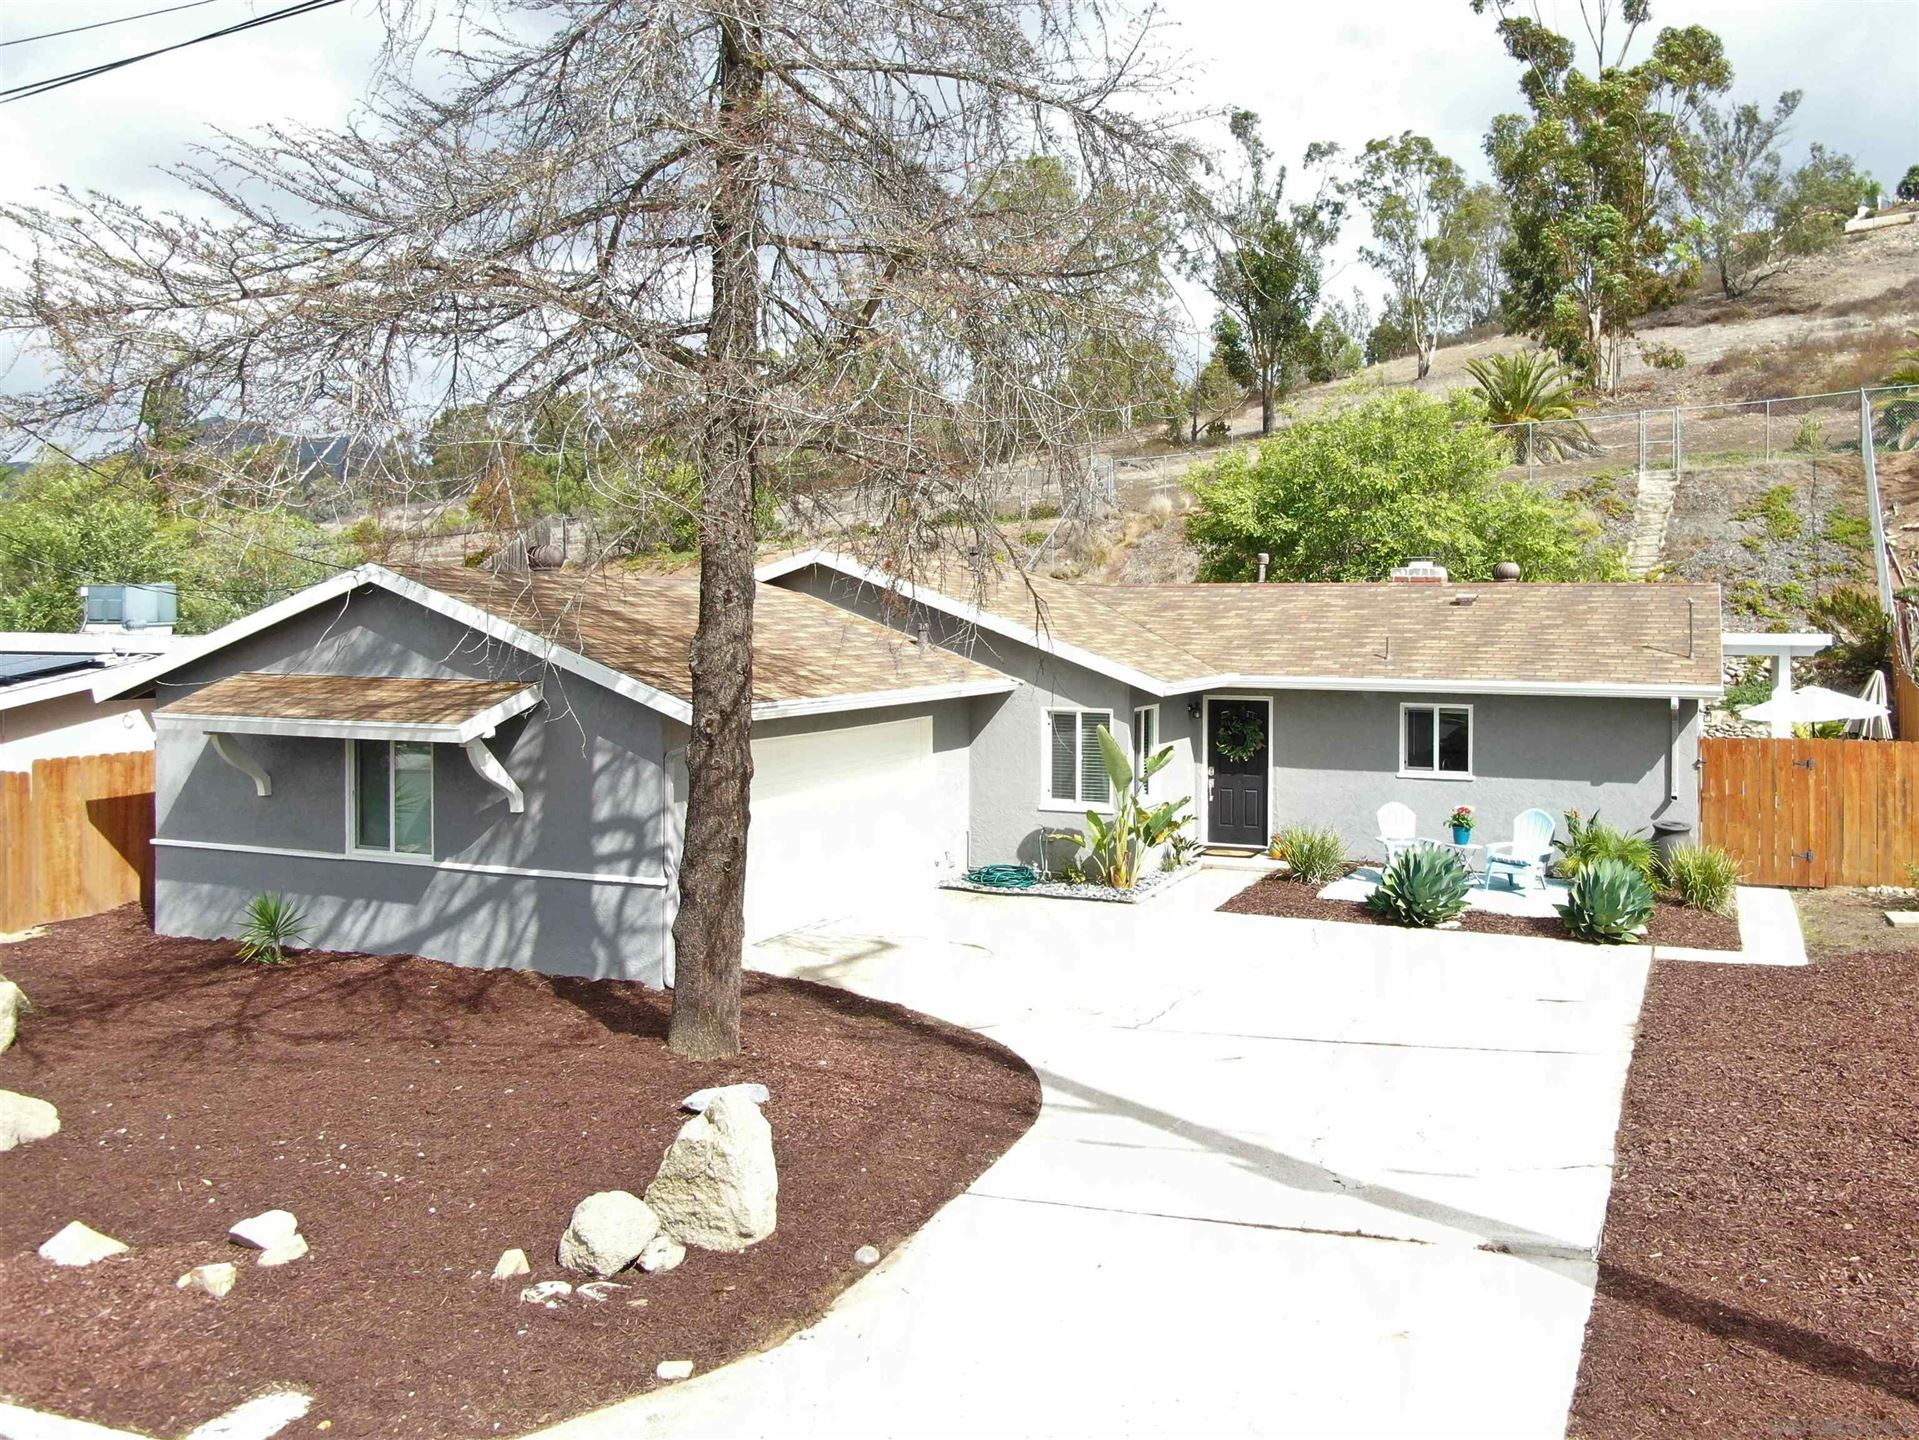 Photo of 14127 Tobiasson Rd, Poway, CA 92064 (MLS # 210028722)